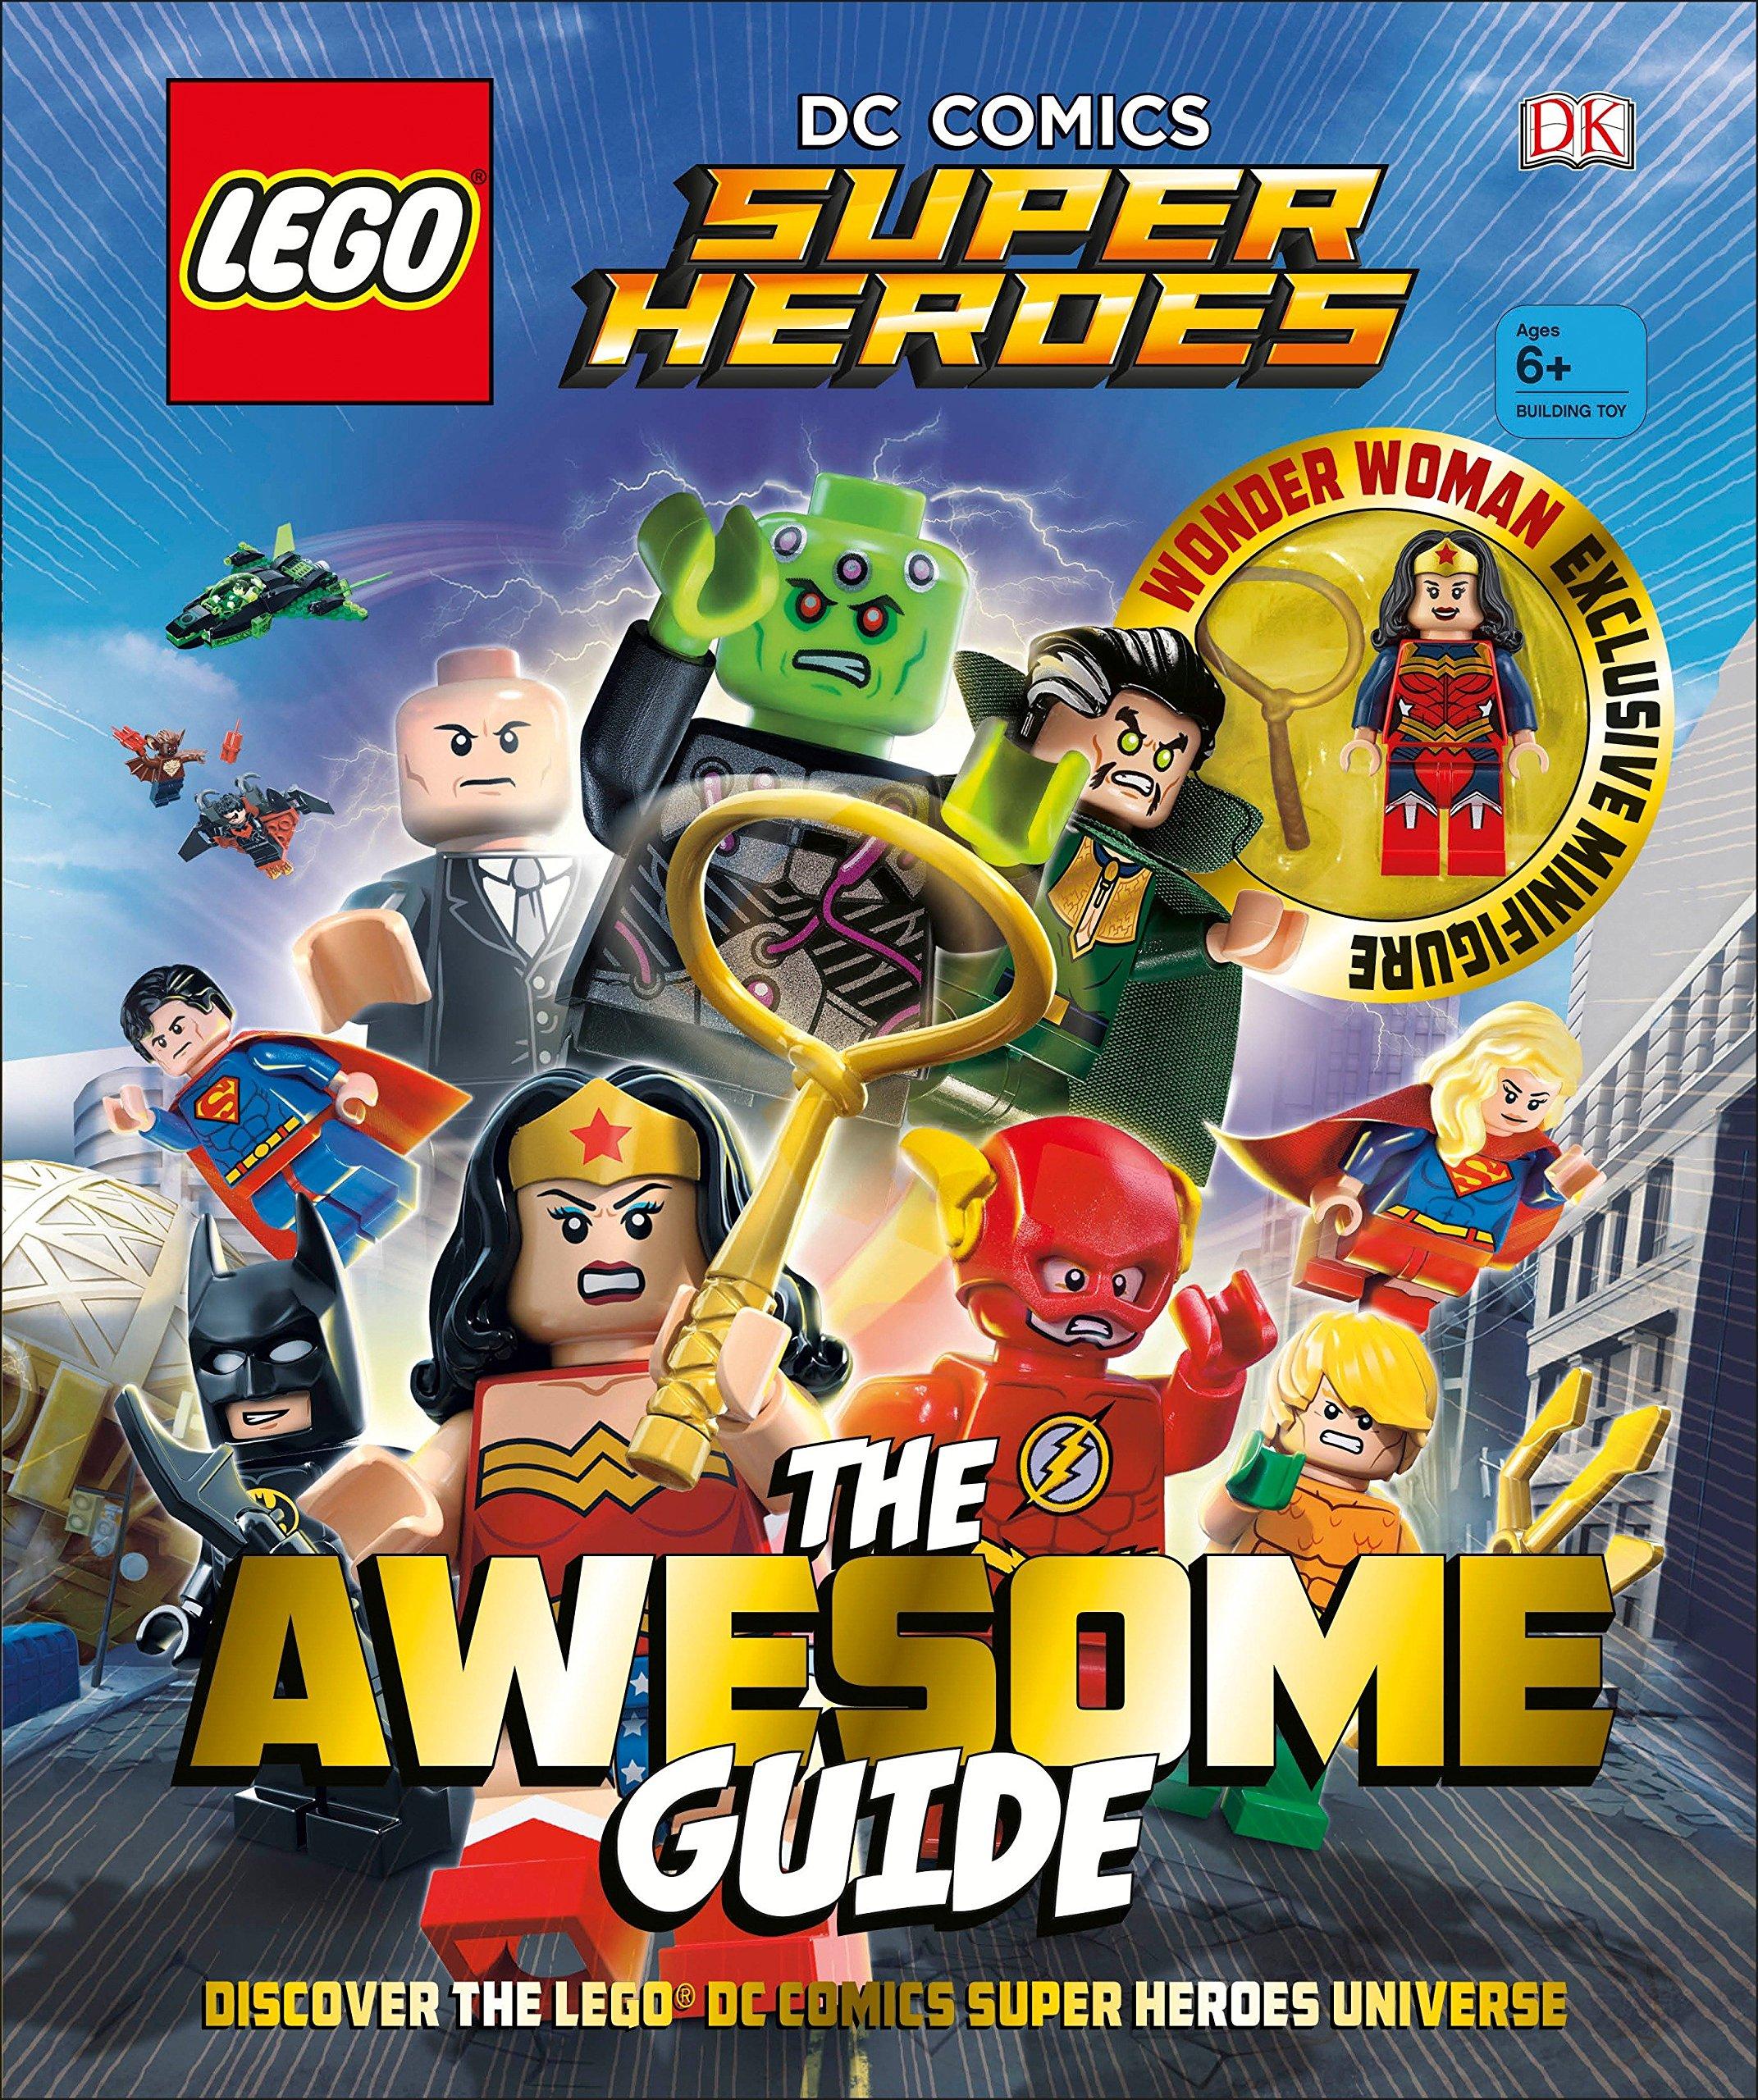 LEGO%C2%AE Comics Super Heroes Awesome